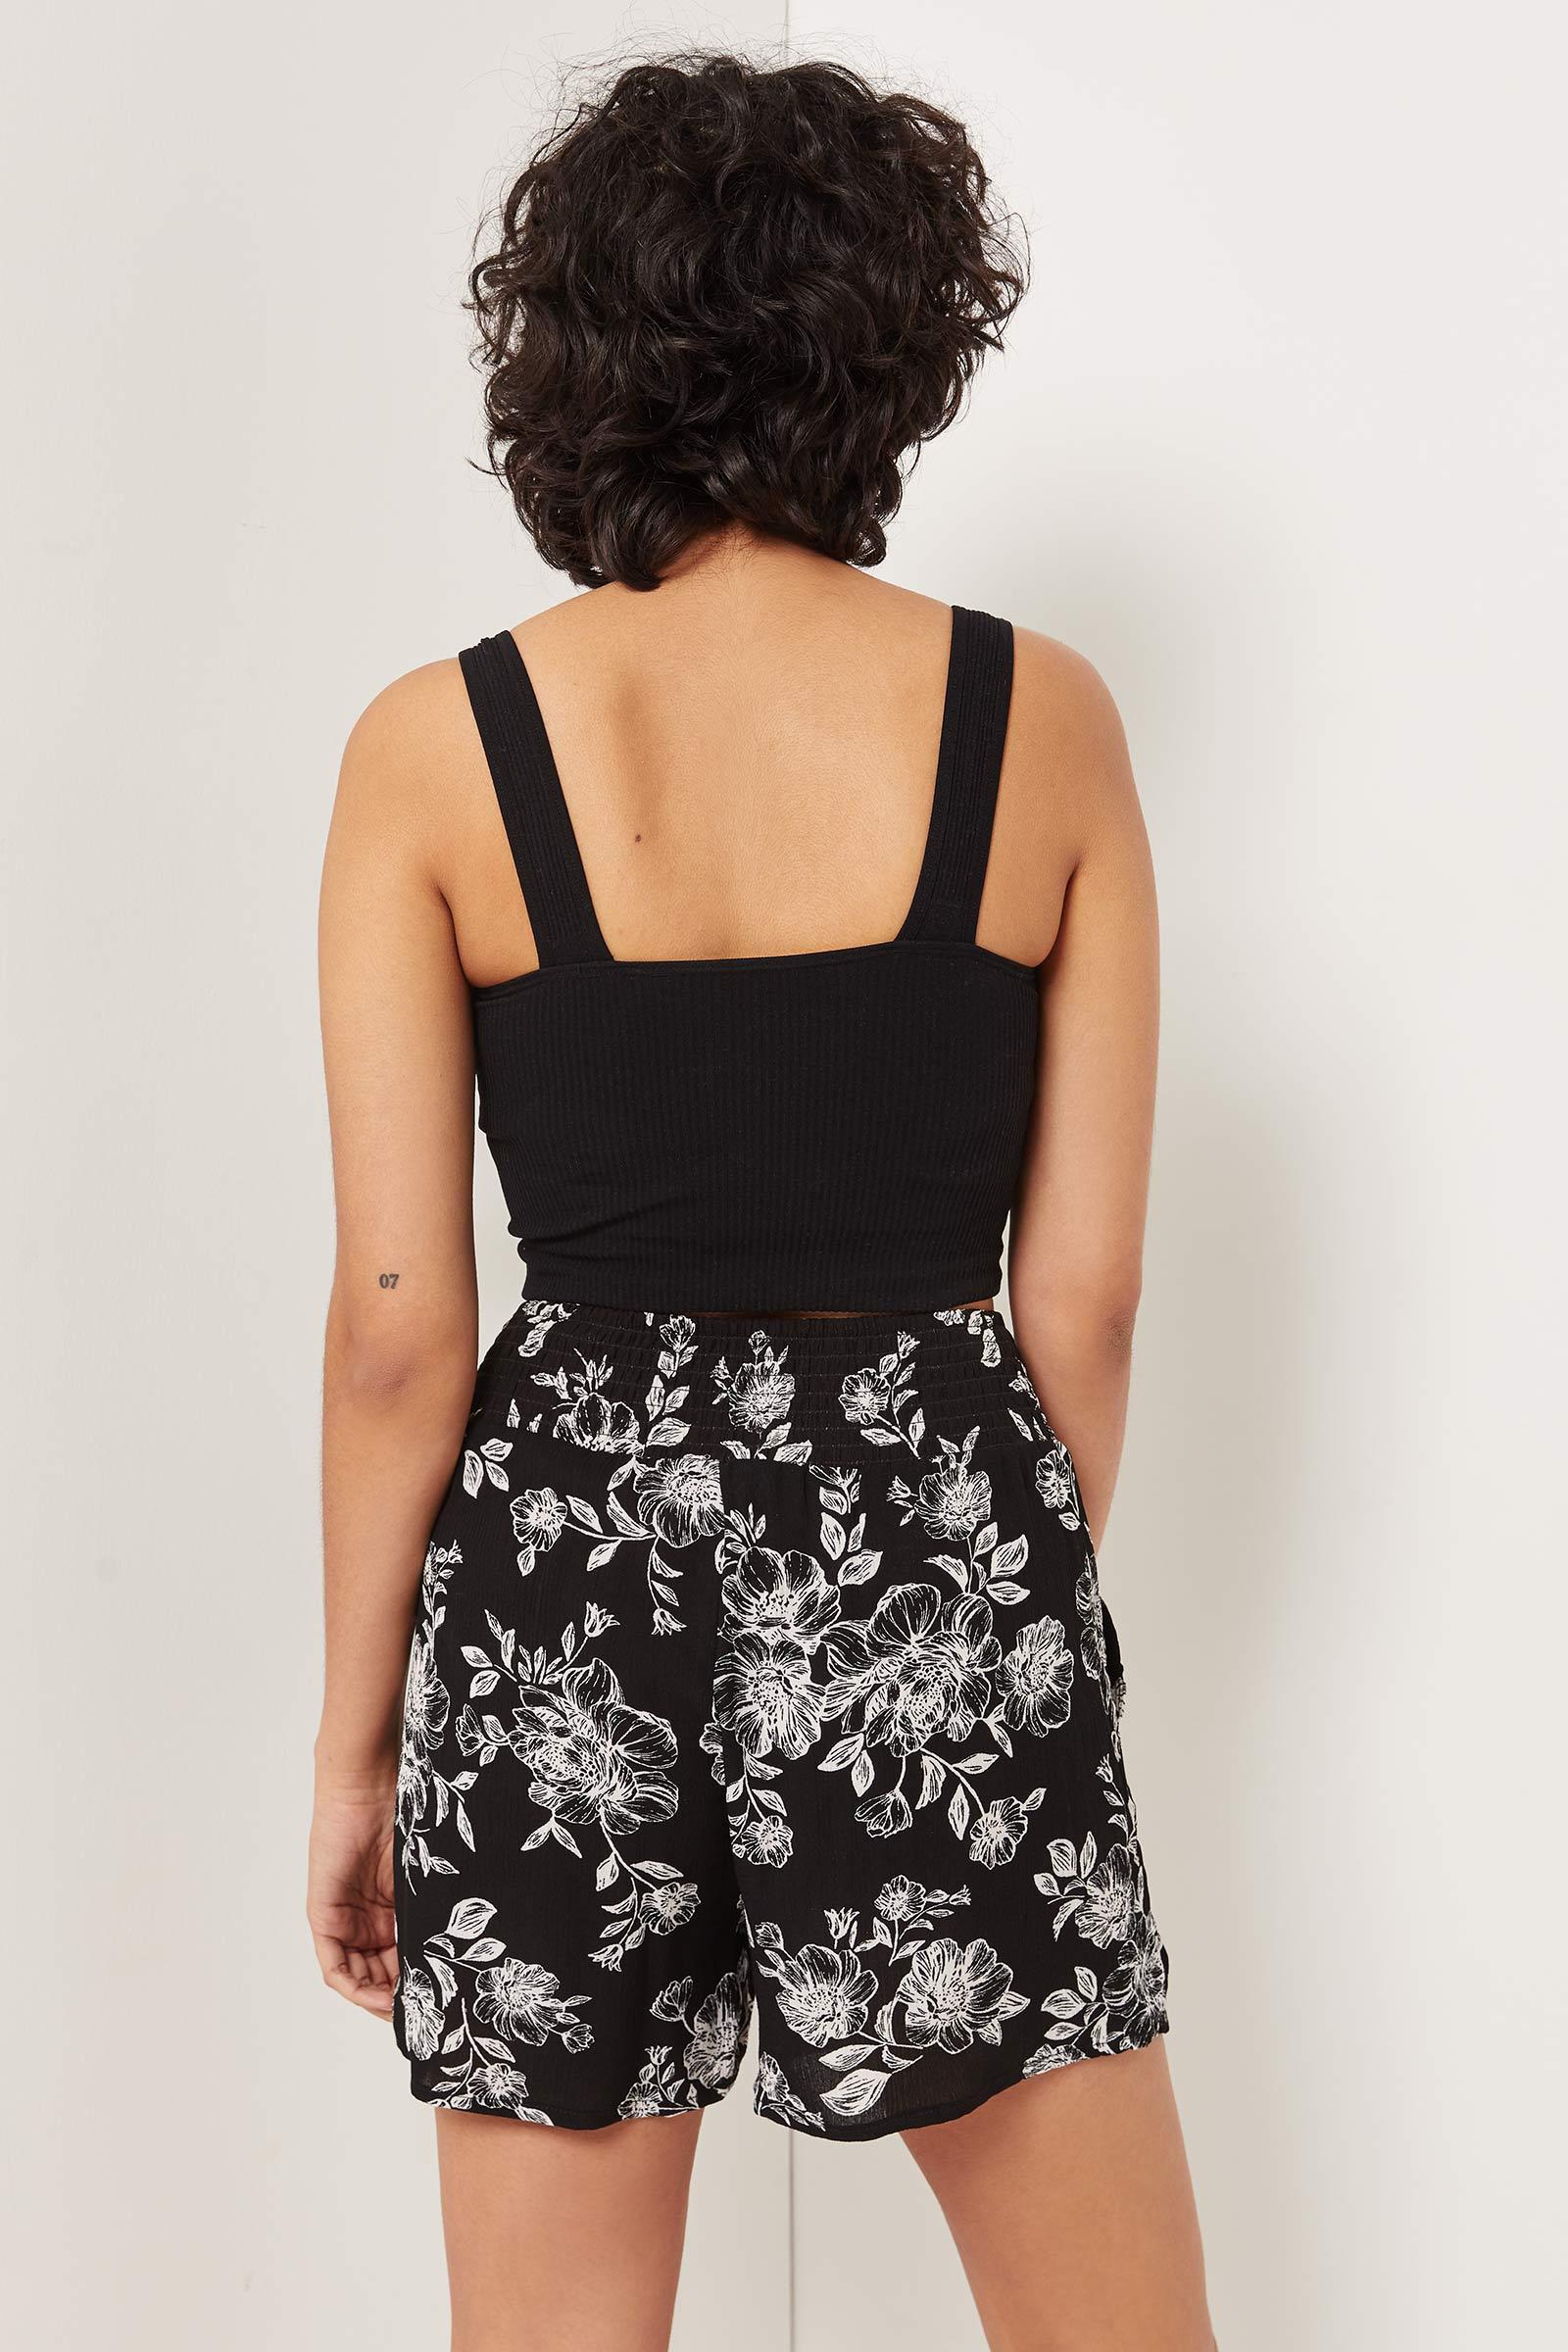 Smocked Floral Shorts